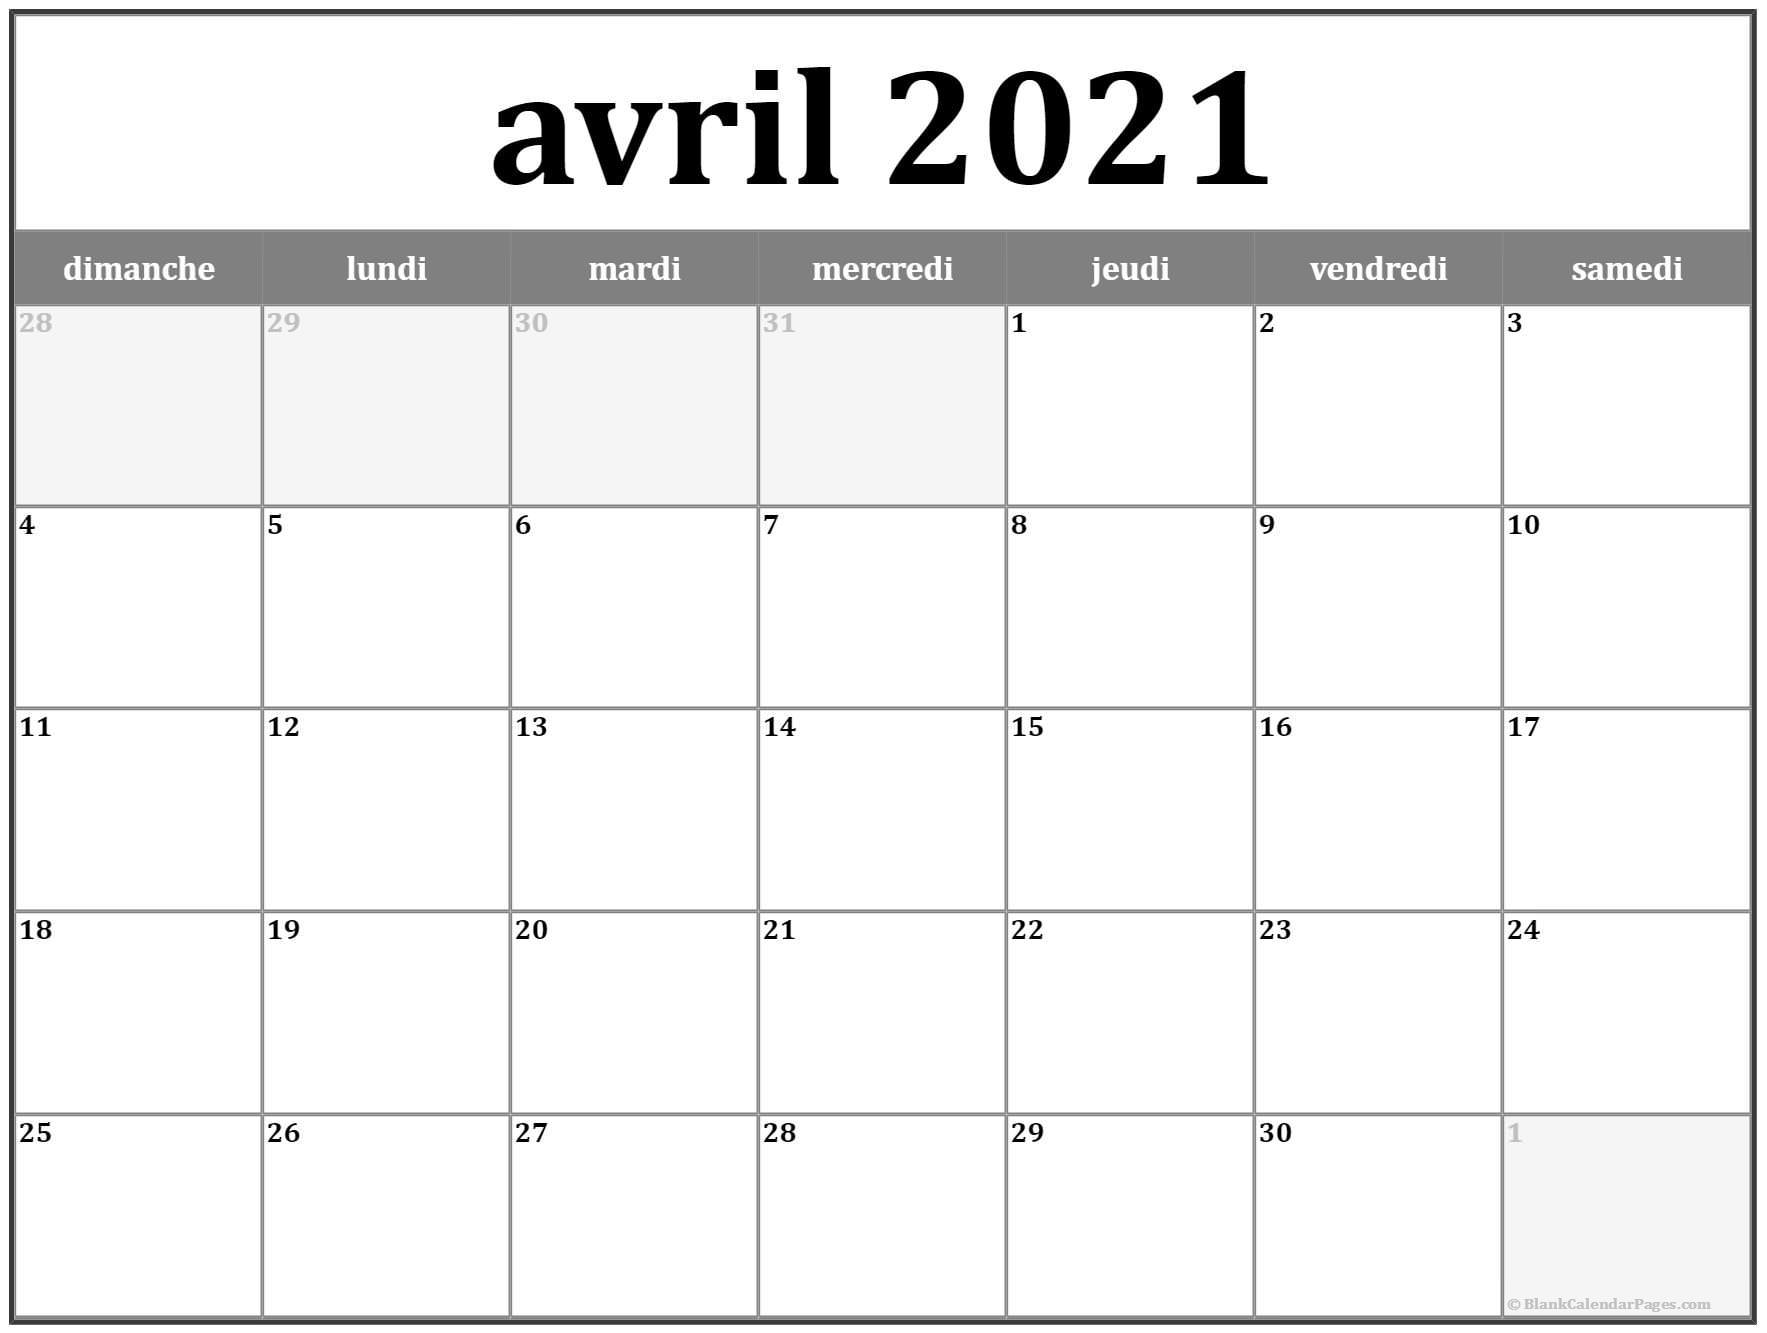 Avril 2021 Calendrier Imprimable | Calendrier Gratuit within Calendrier À Imprimer 2021